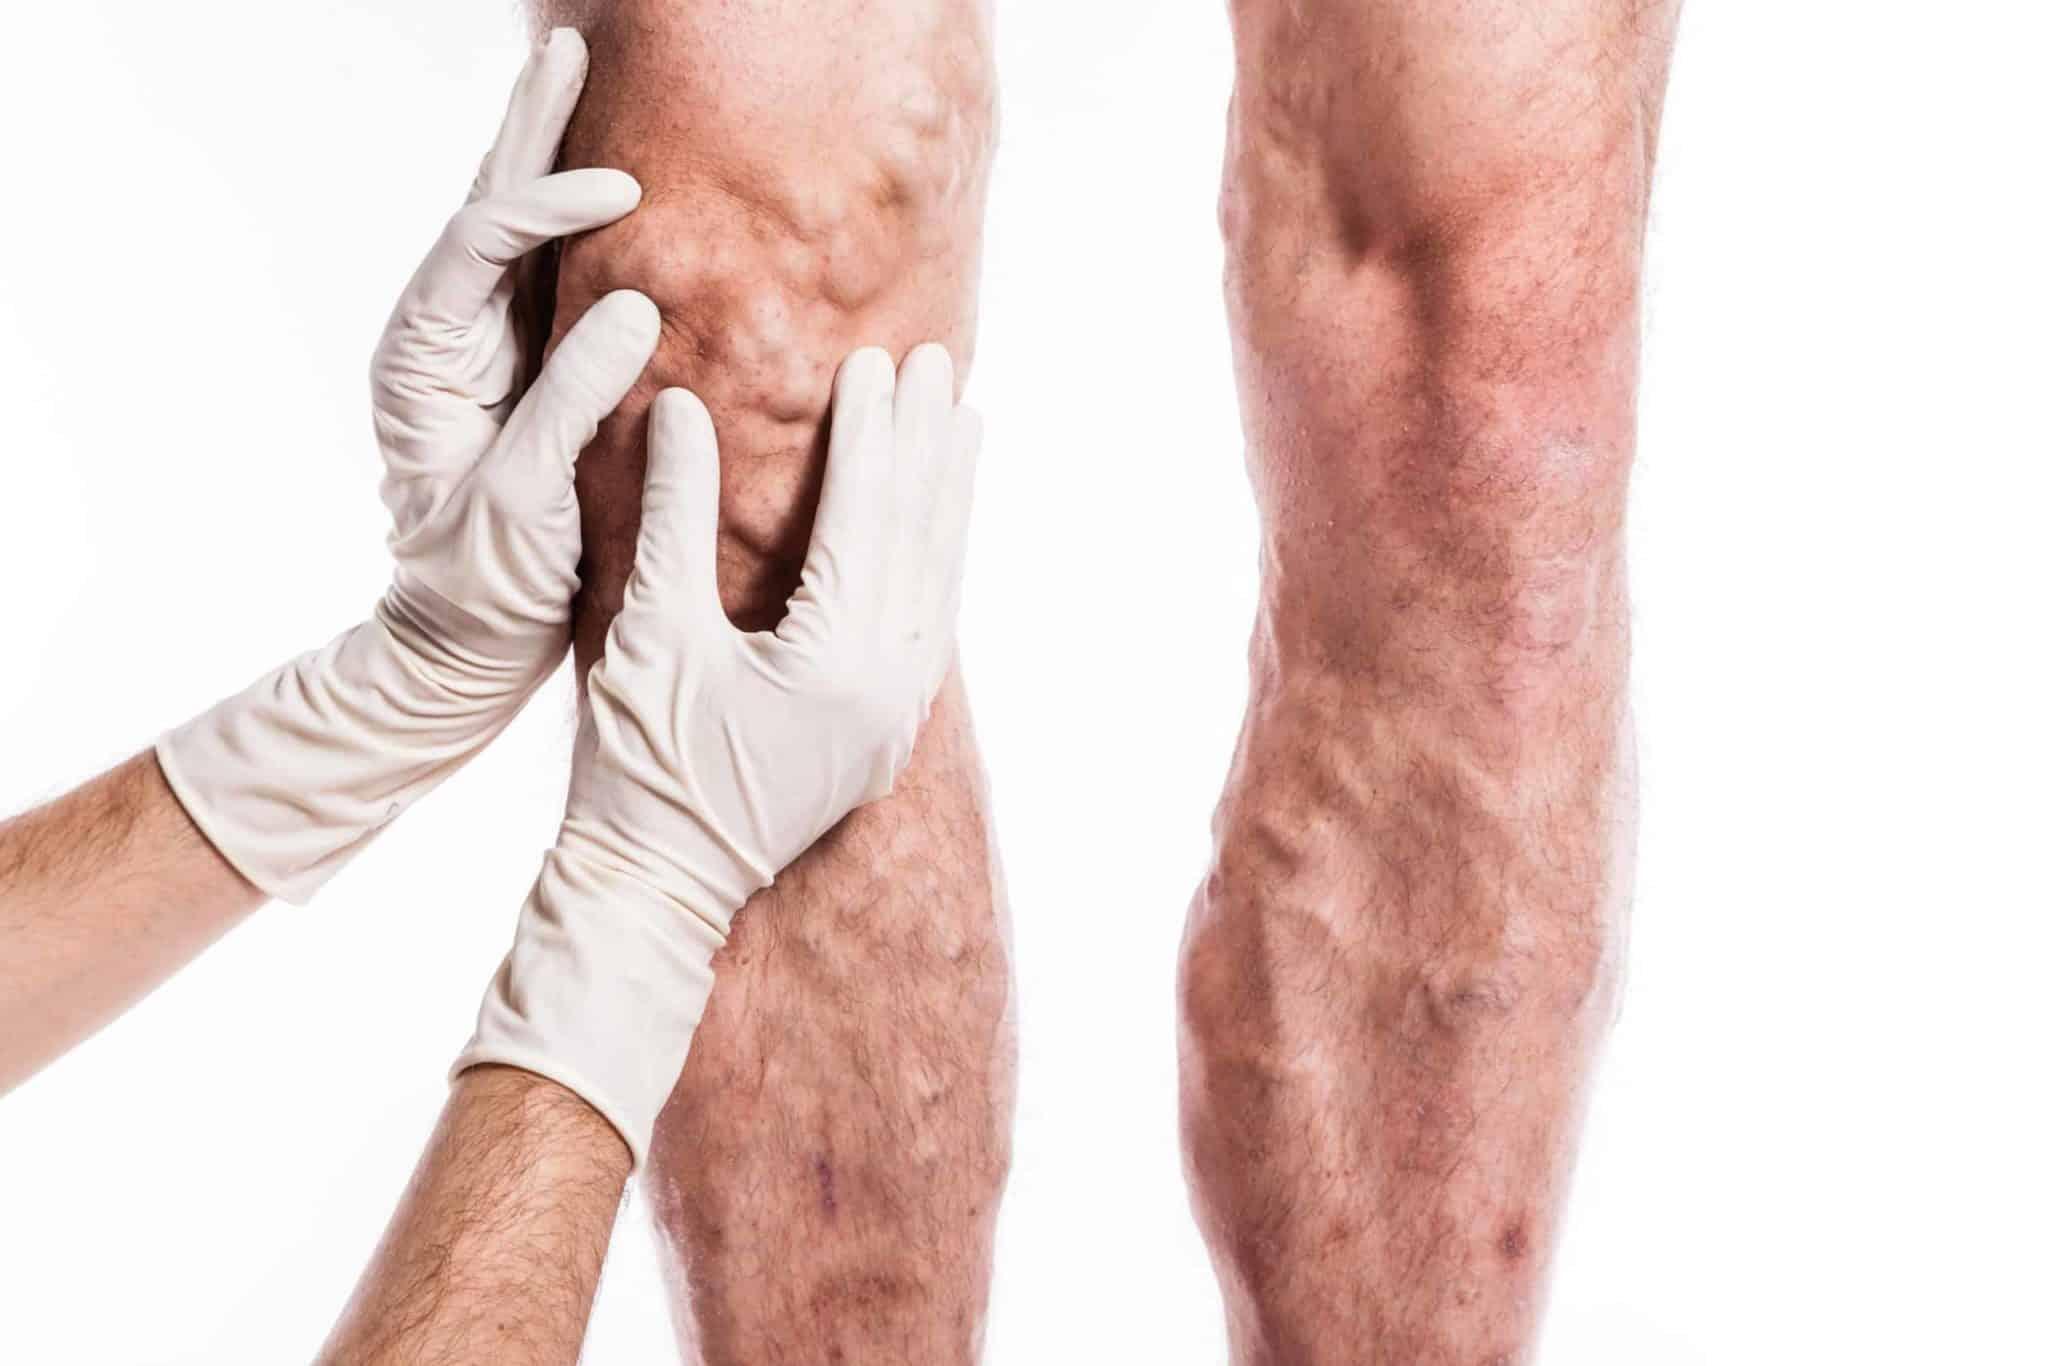 severe varicose veins